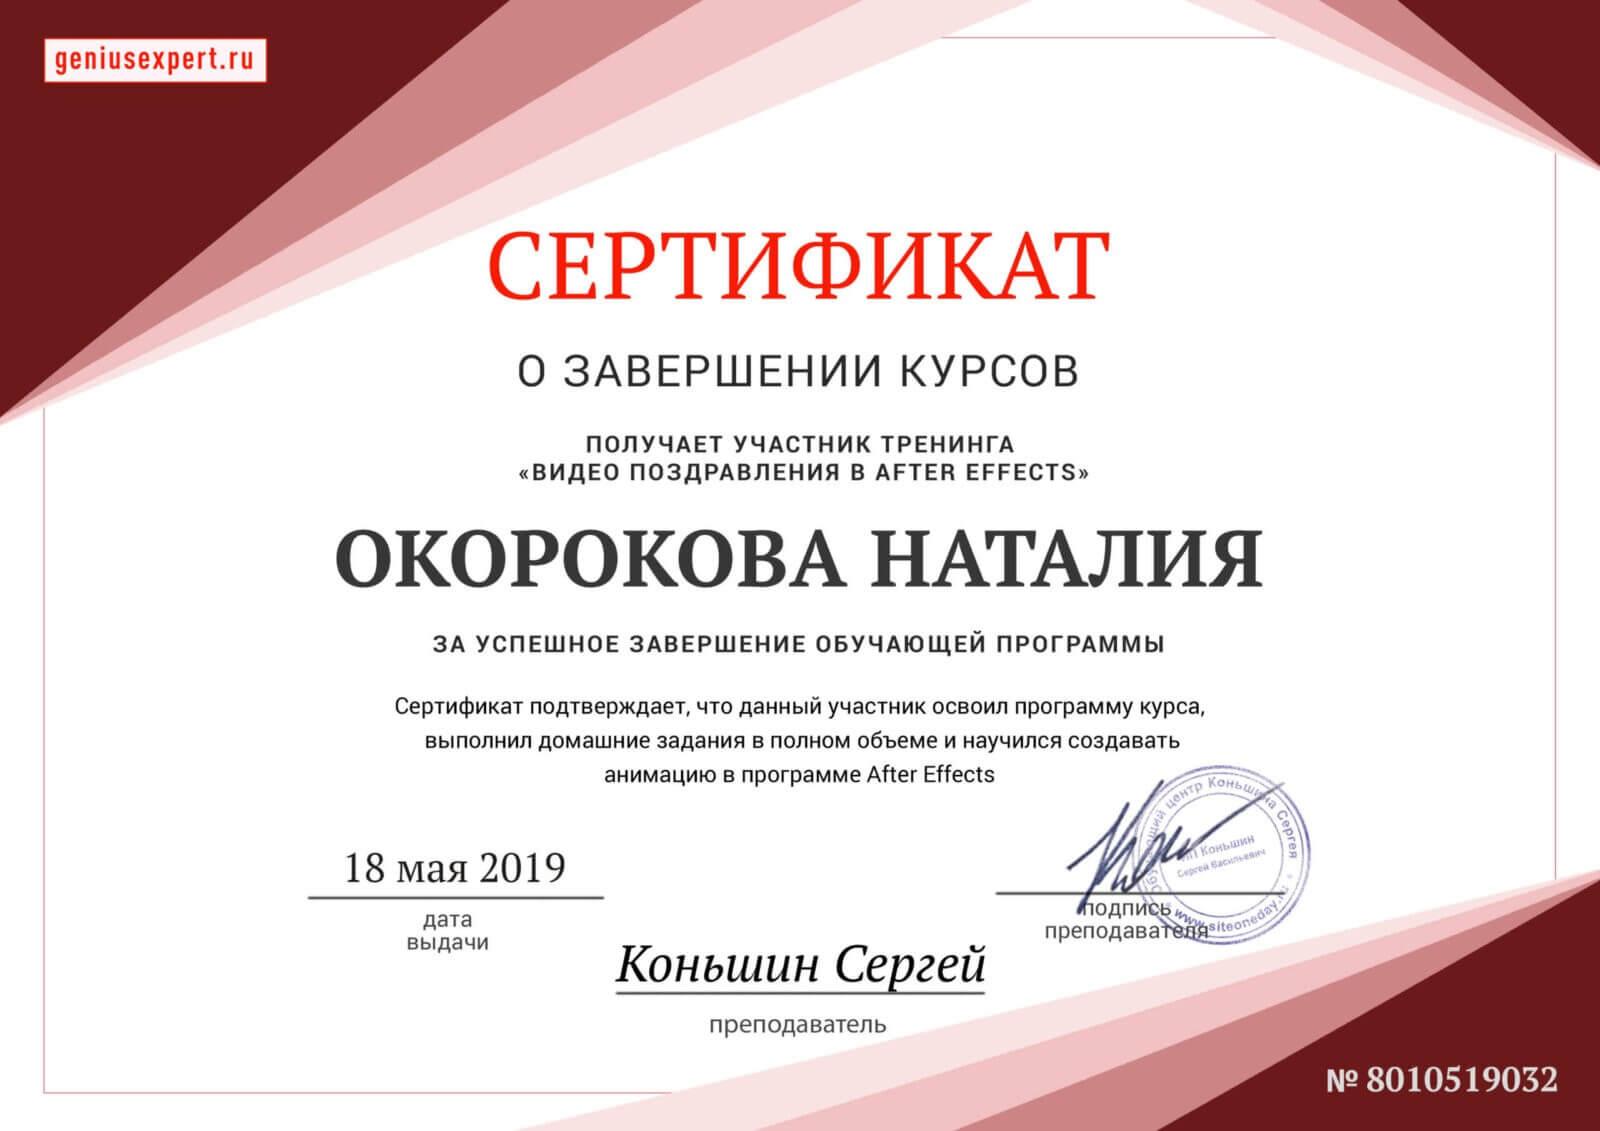 moi-dostizheniya-sertificat-po-kurcu-aftereffects